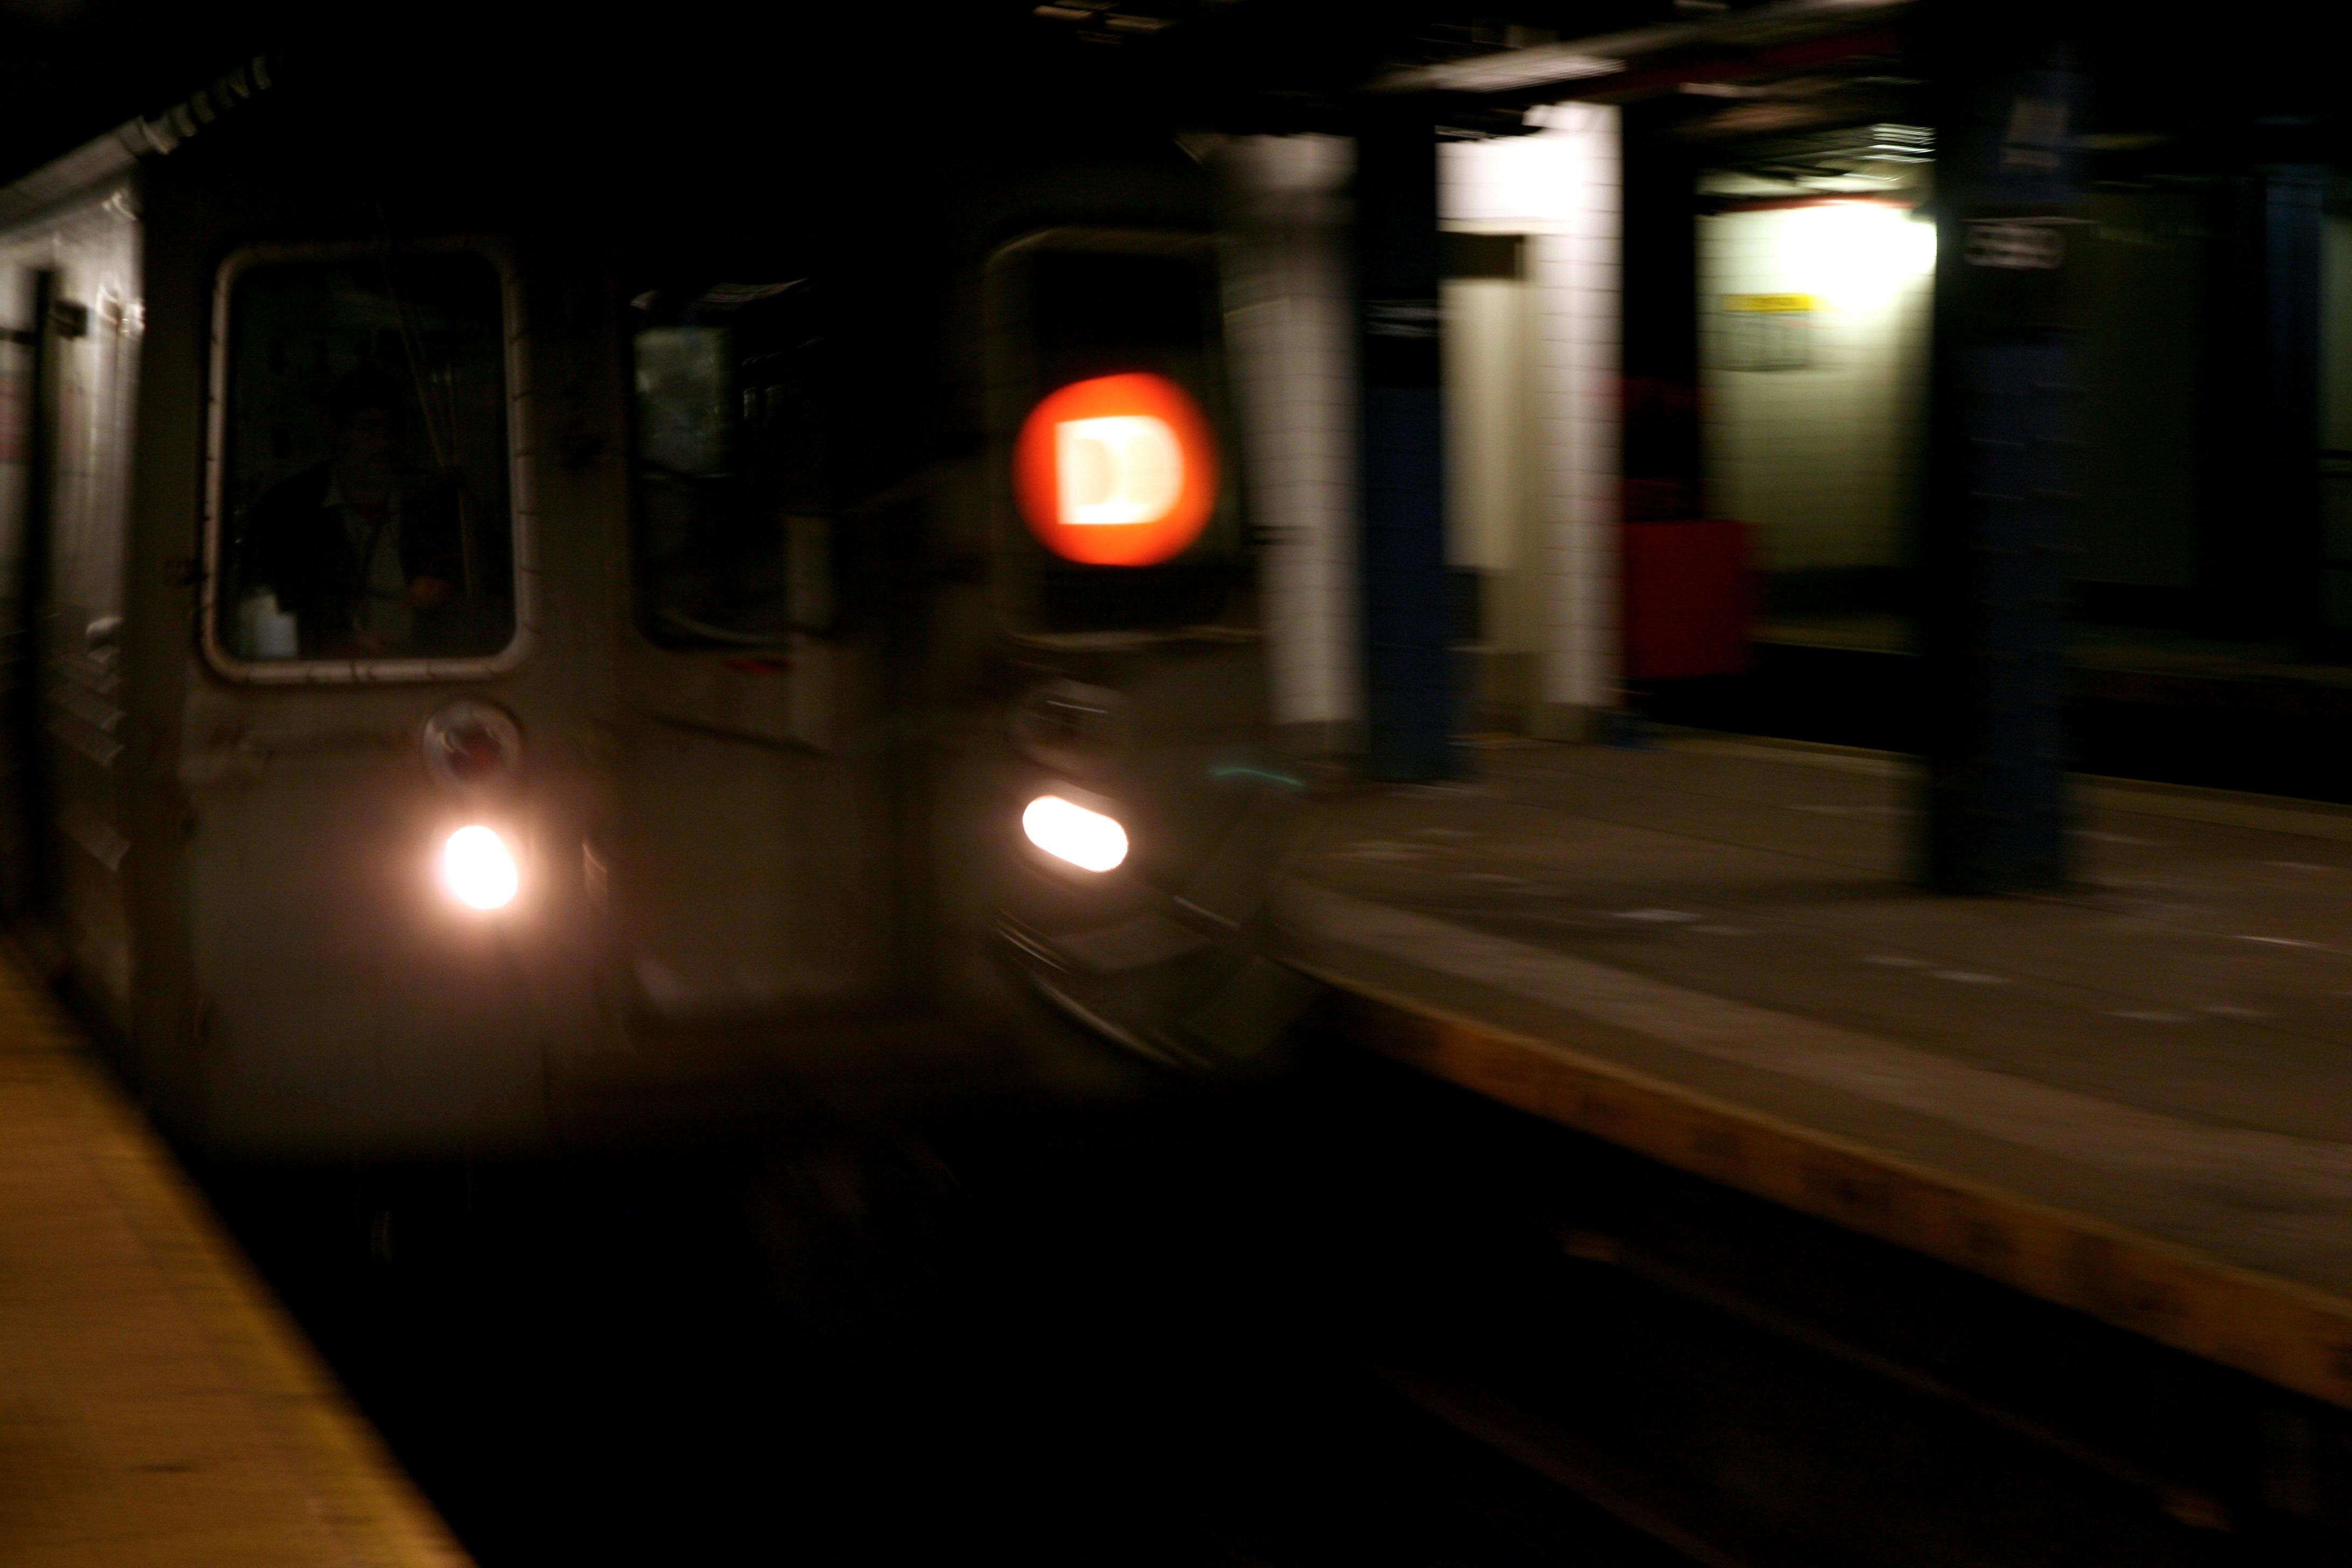 free images light night subway metro nyc darkness